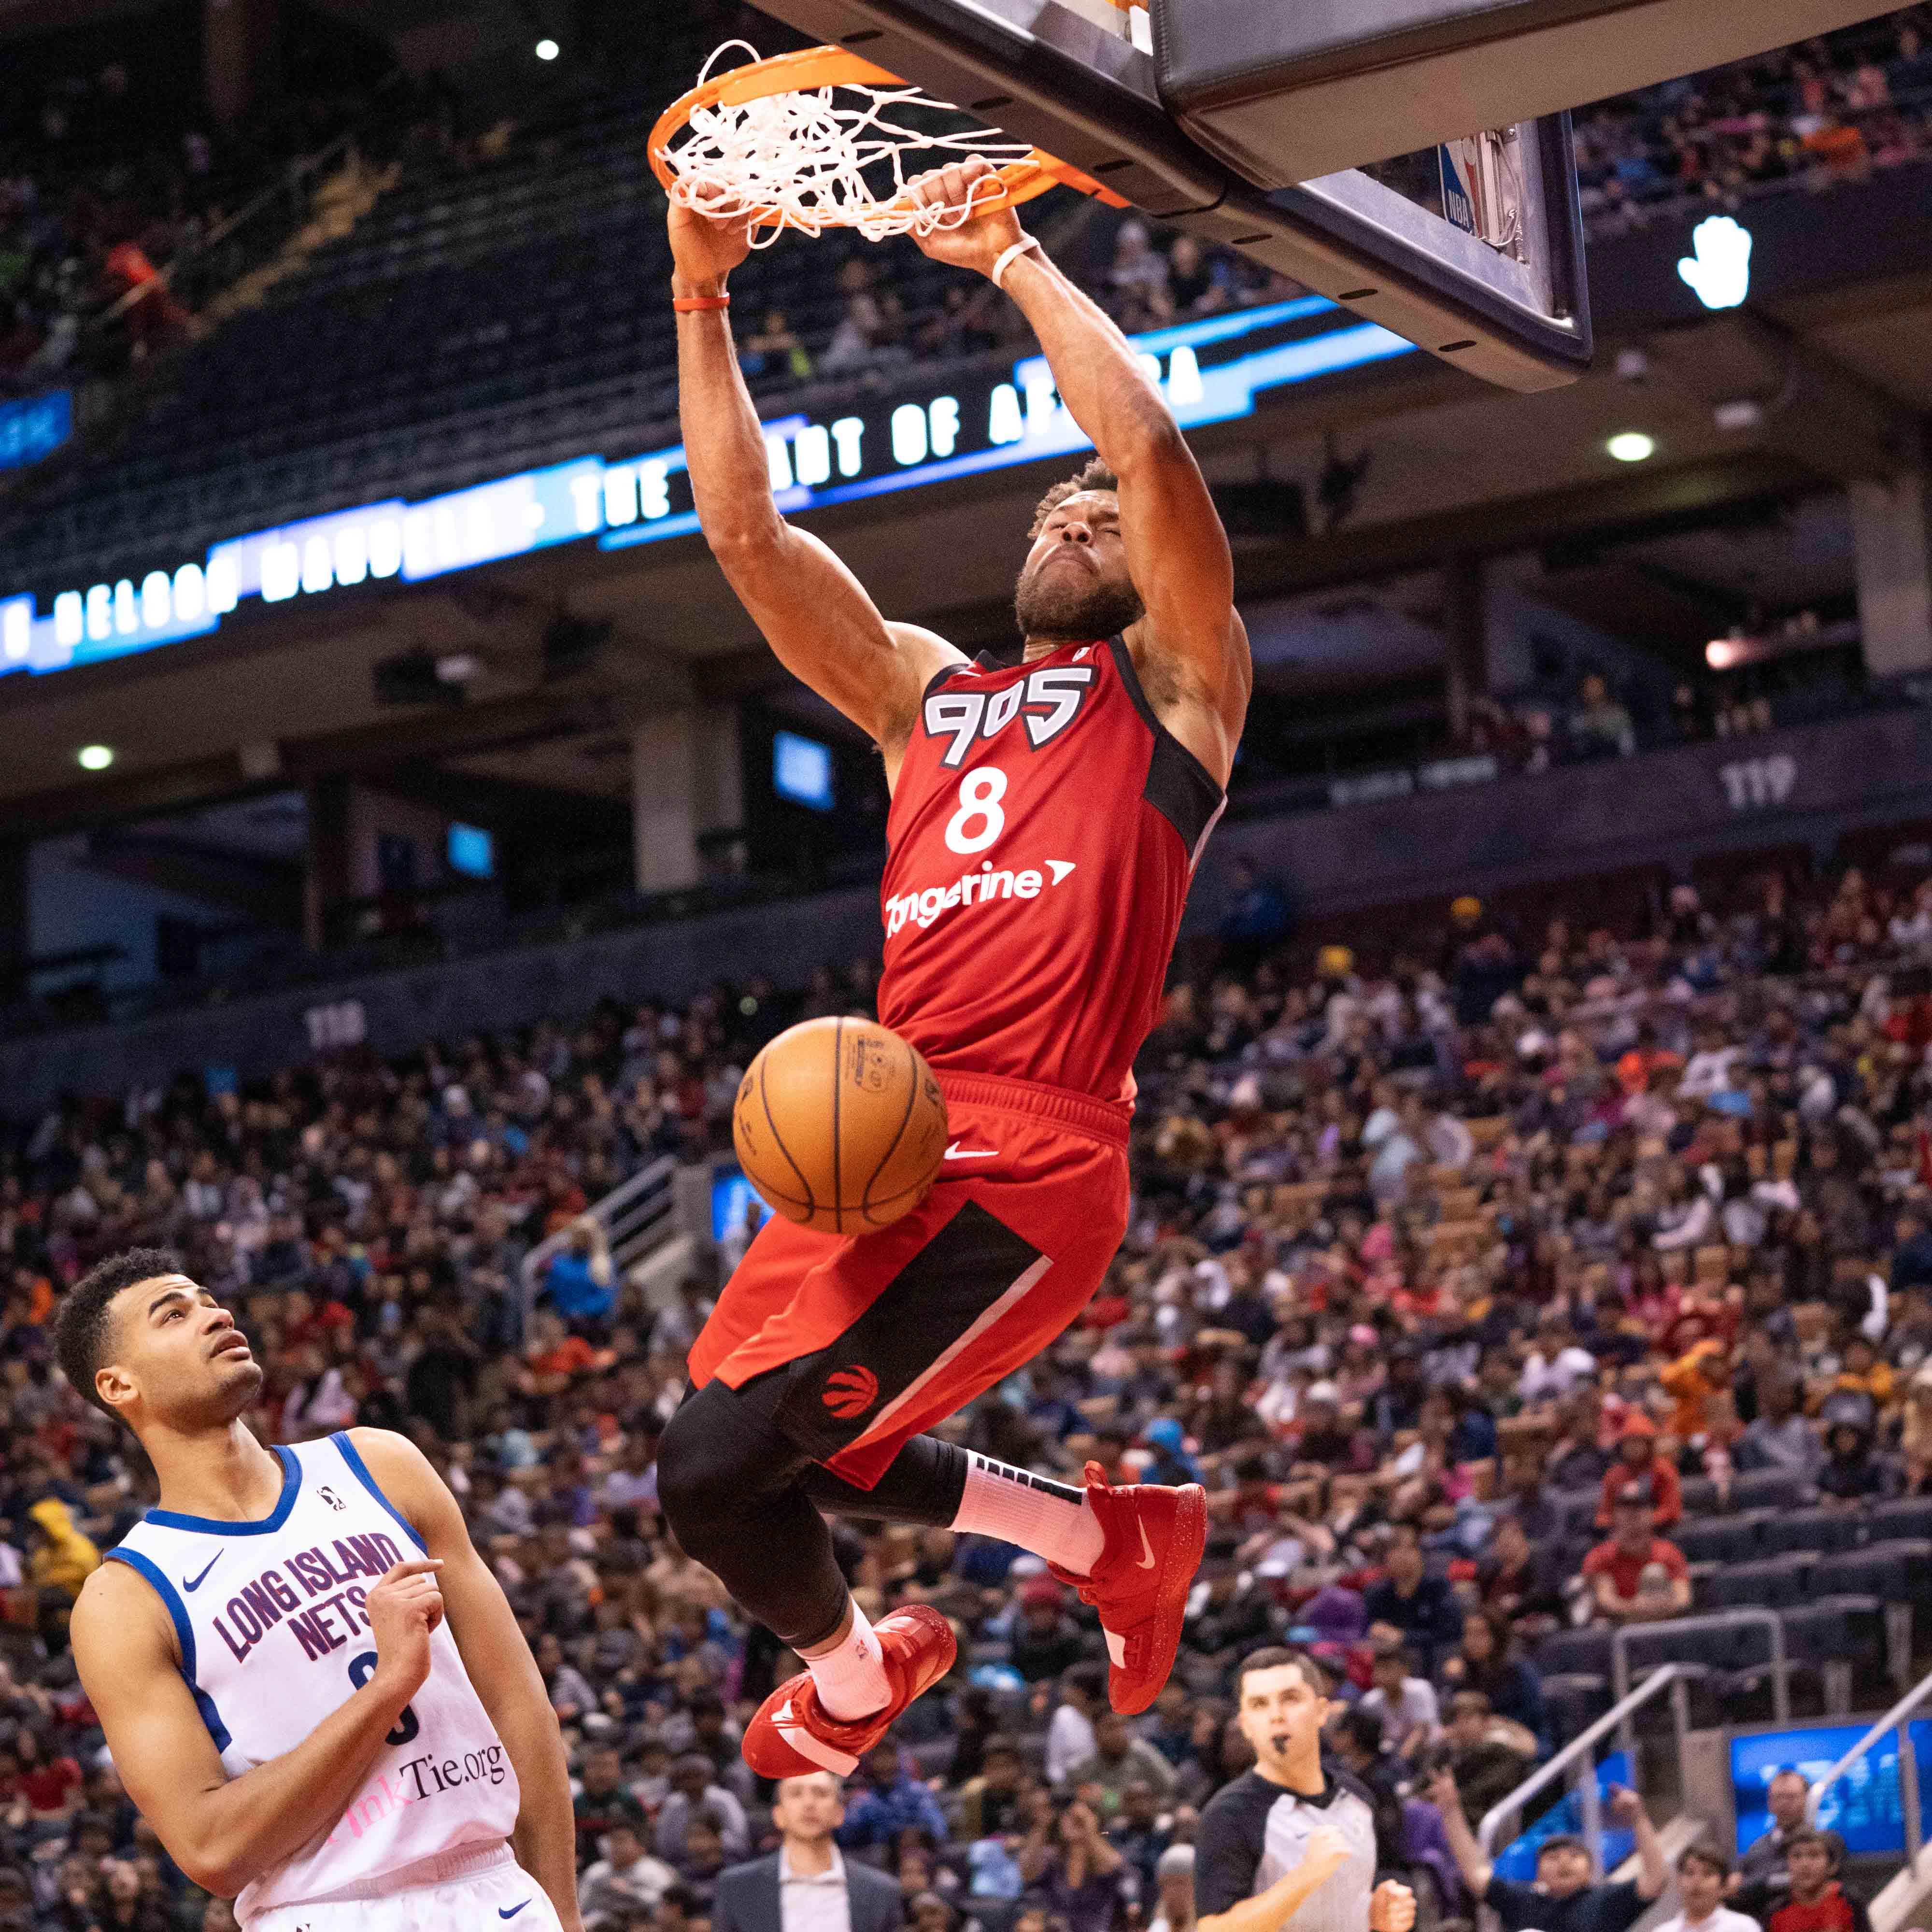 Raptors 905 comeback falls short in loss to Long Island